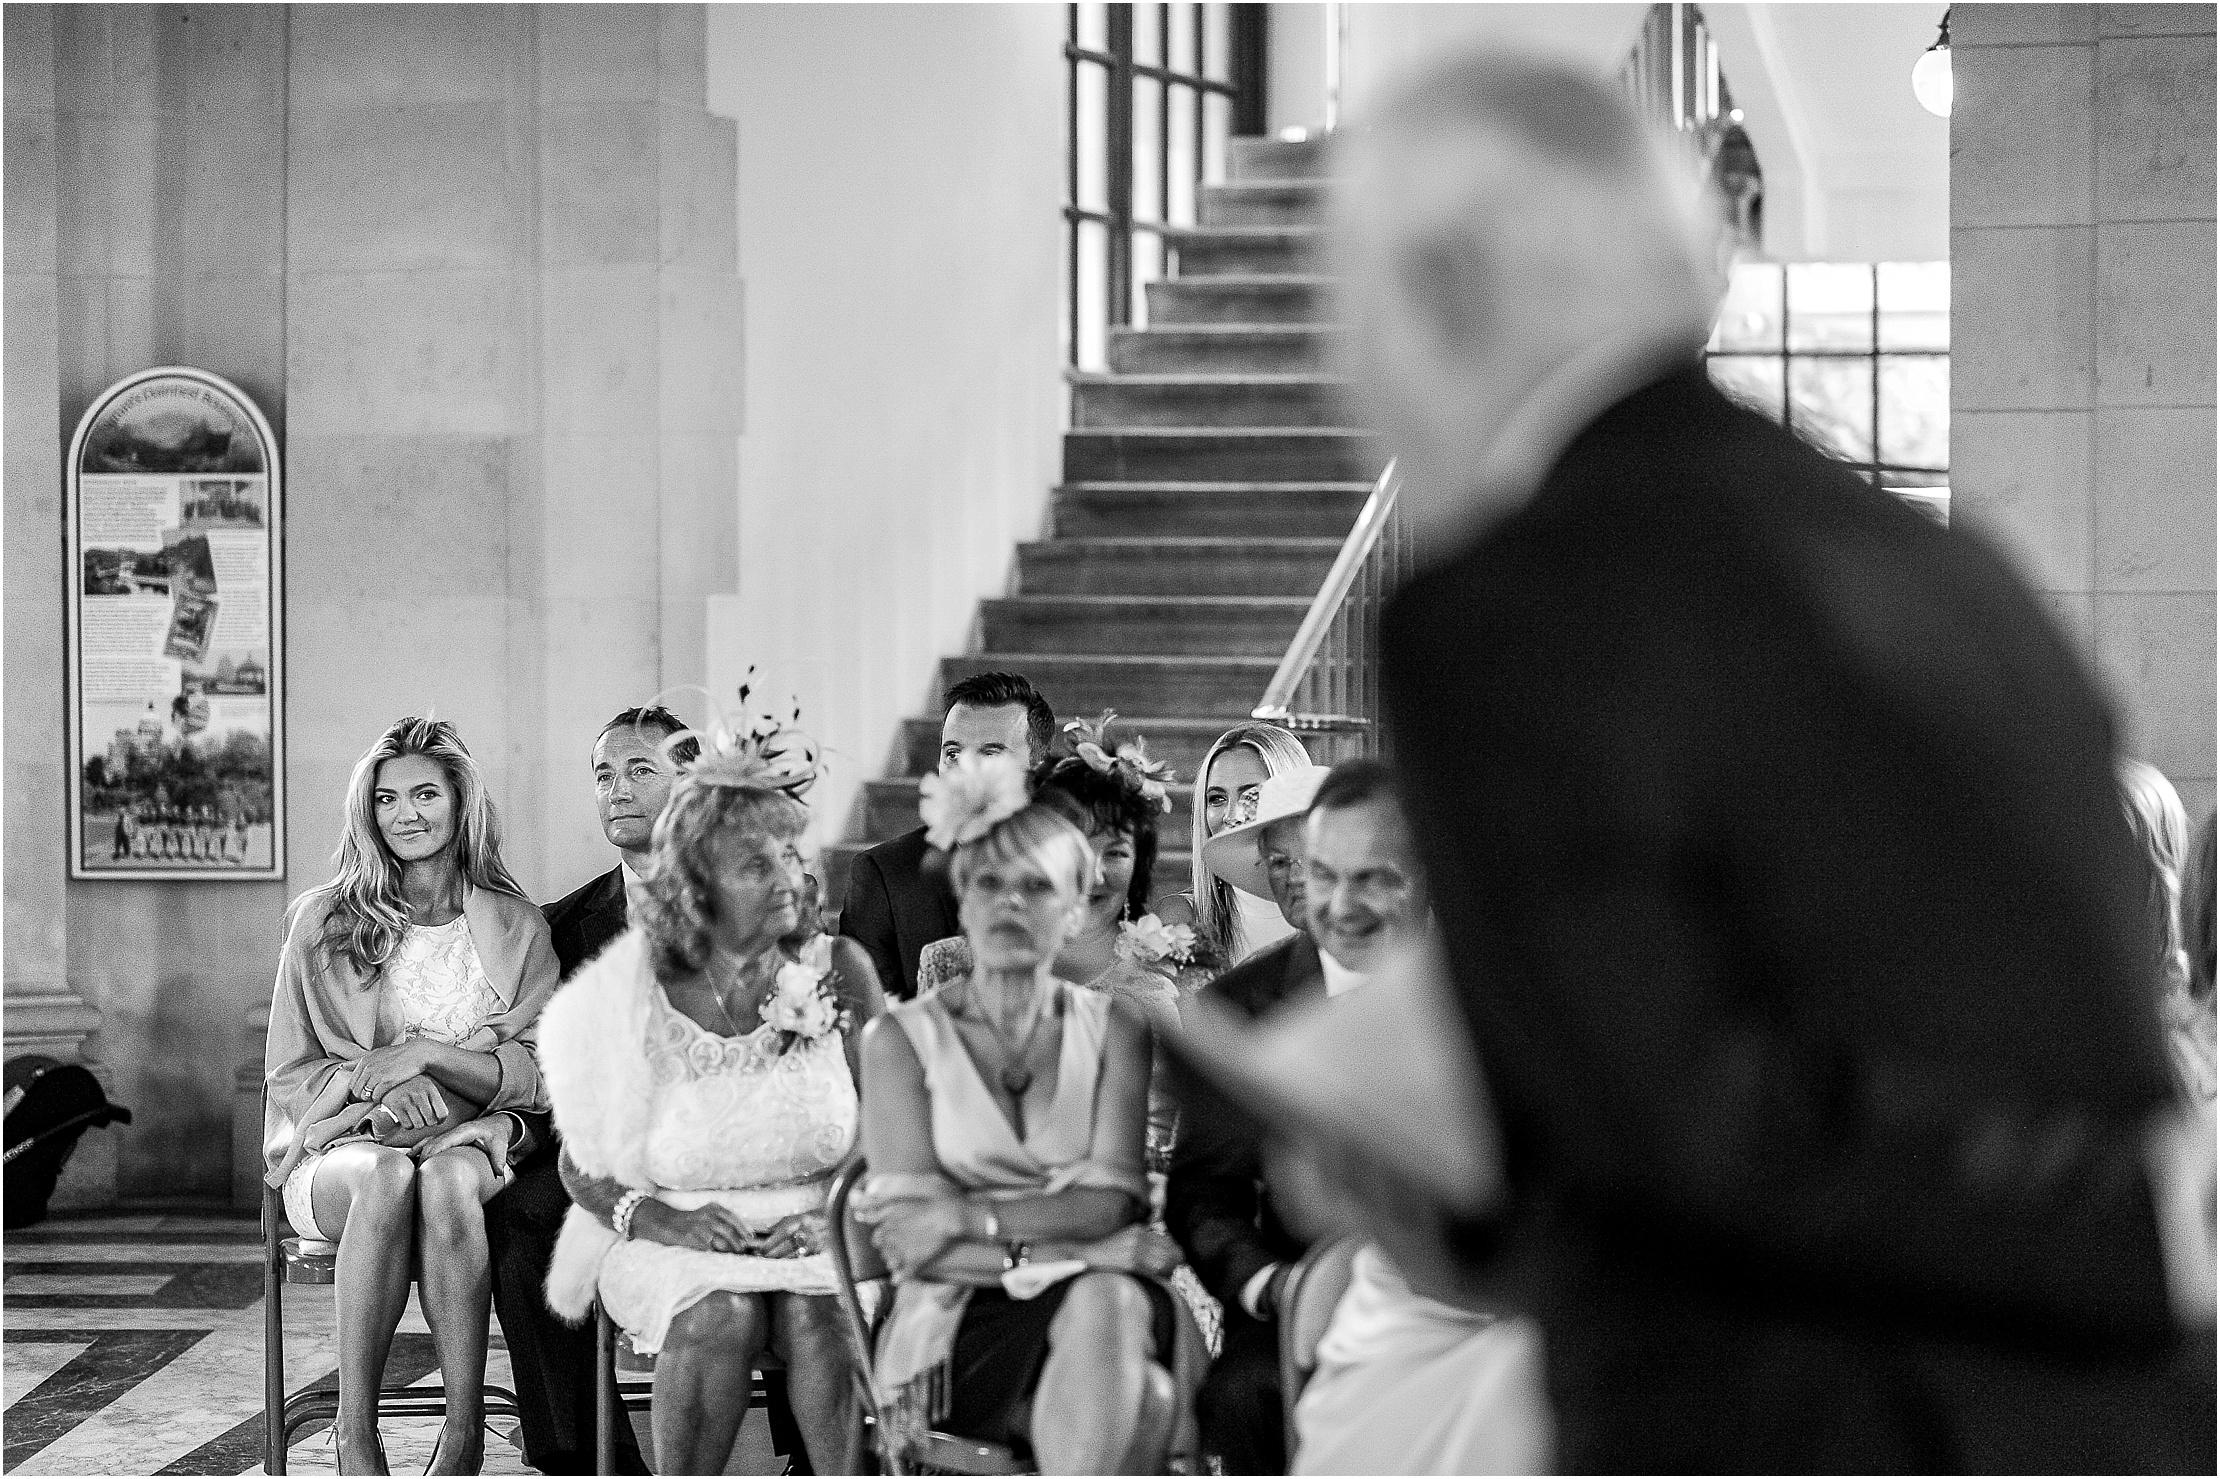 staining-lodge-wedding-064.jpg